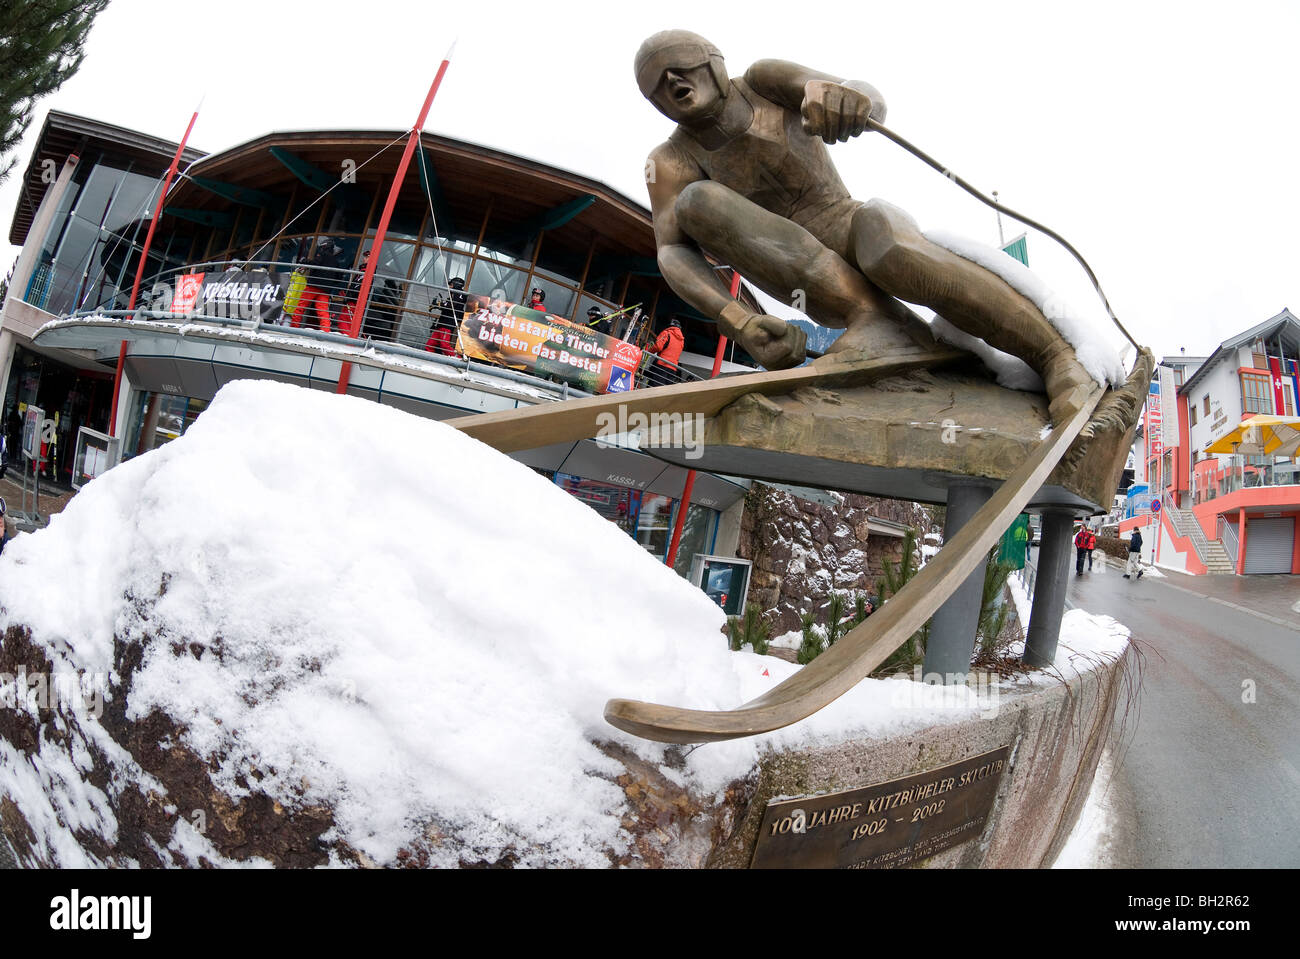 downhill skier sculpture outside hahnenkamm lift, kitzbuhel, austria - Stock Image